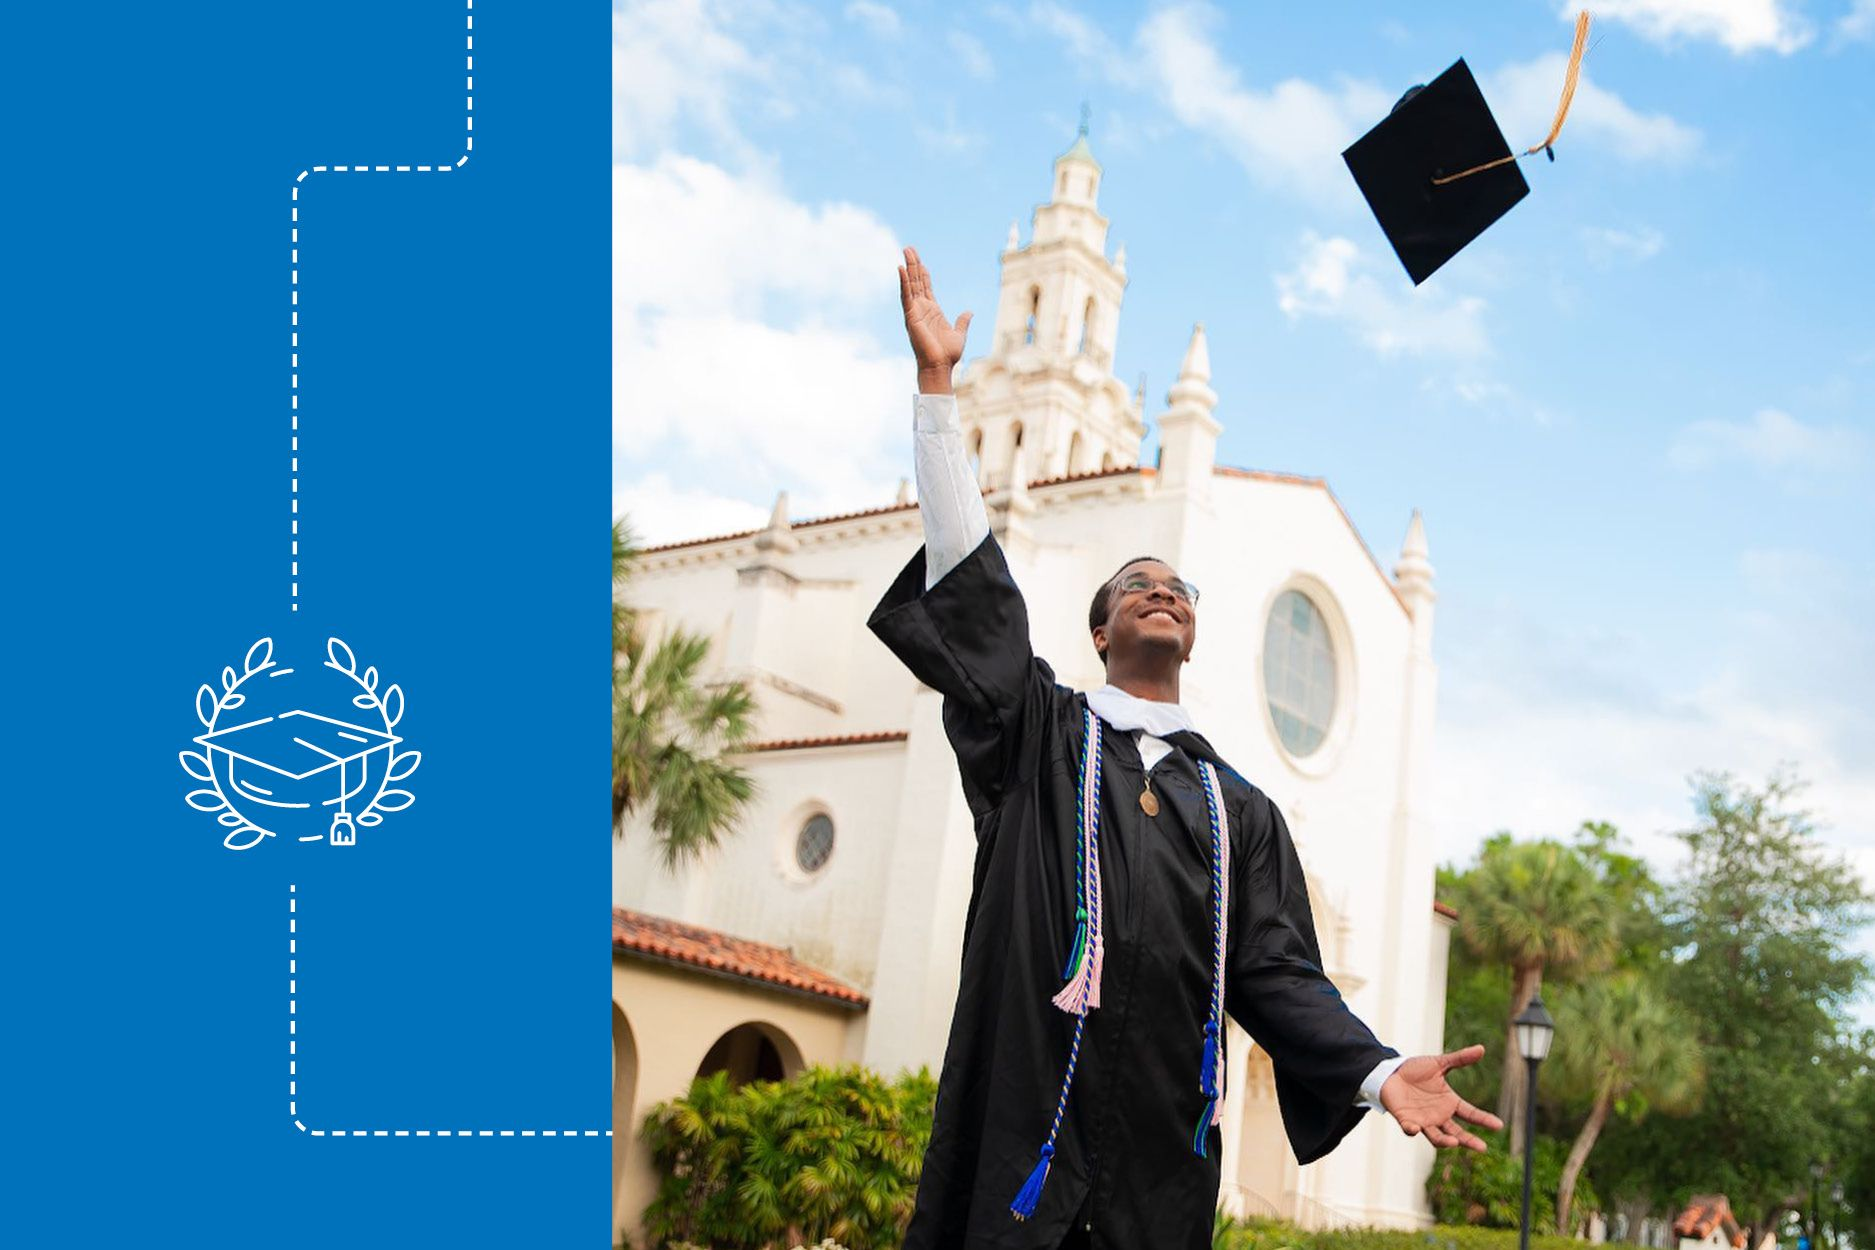 Brandon McNichol tosses his cap in the air at graduation.